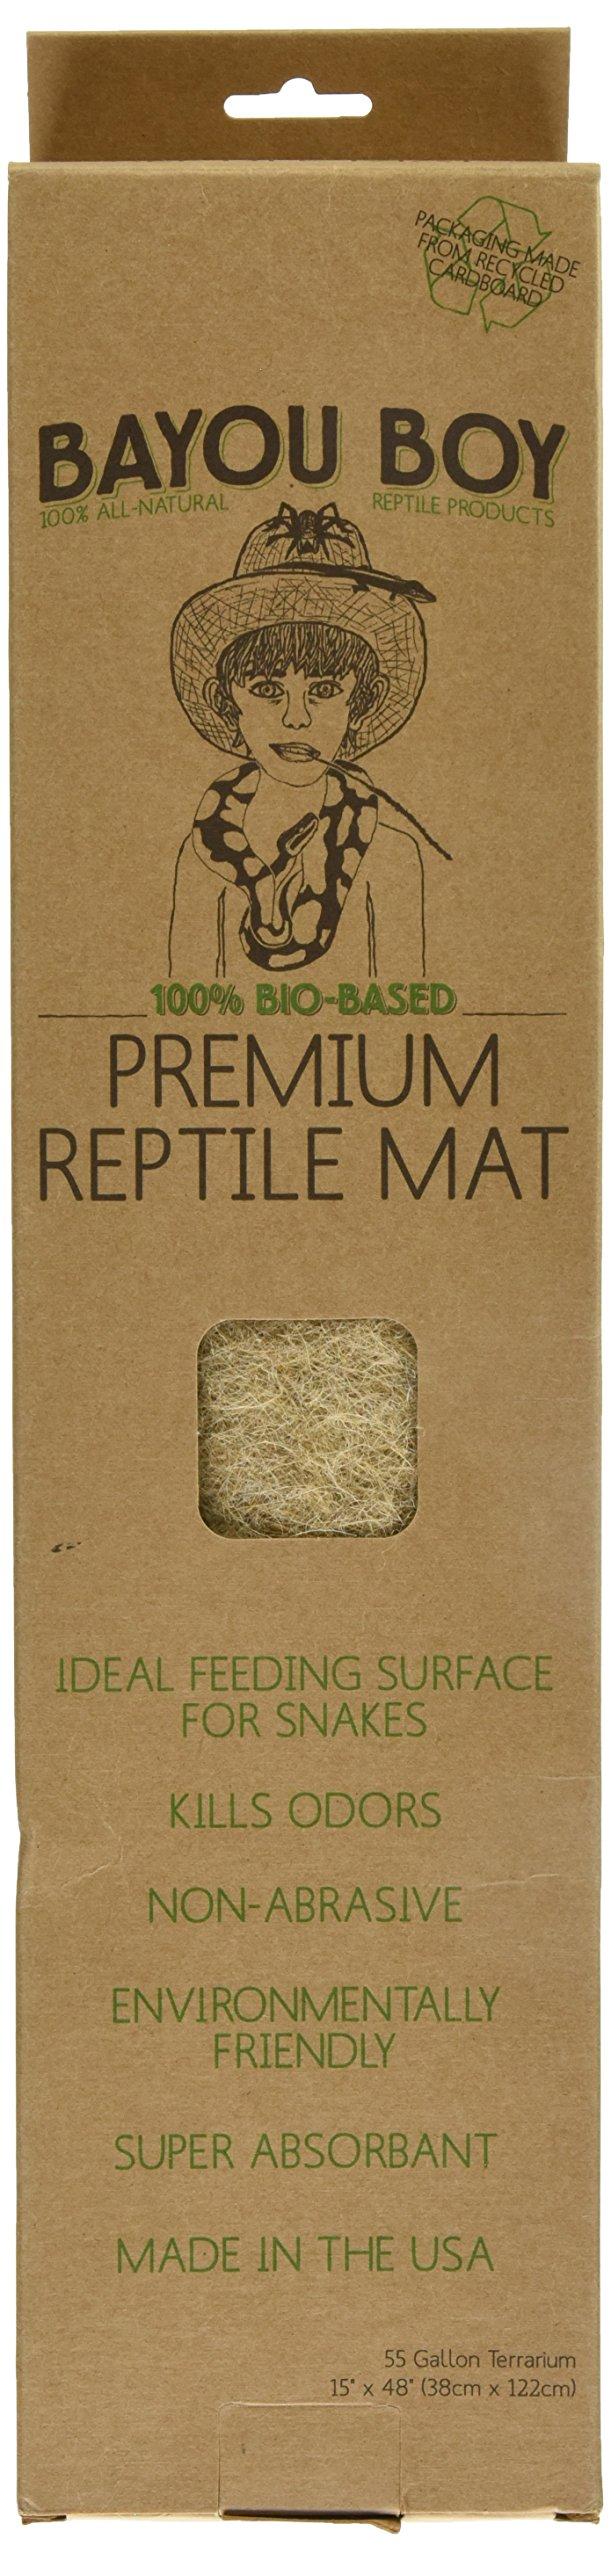 Bayou Boy Premium Reptile Mat, 15 by 48-Inch